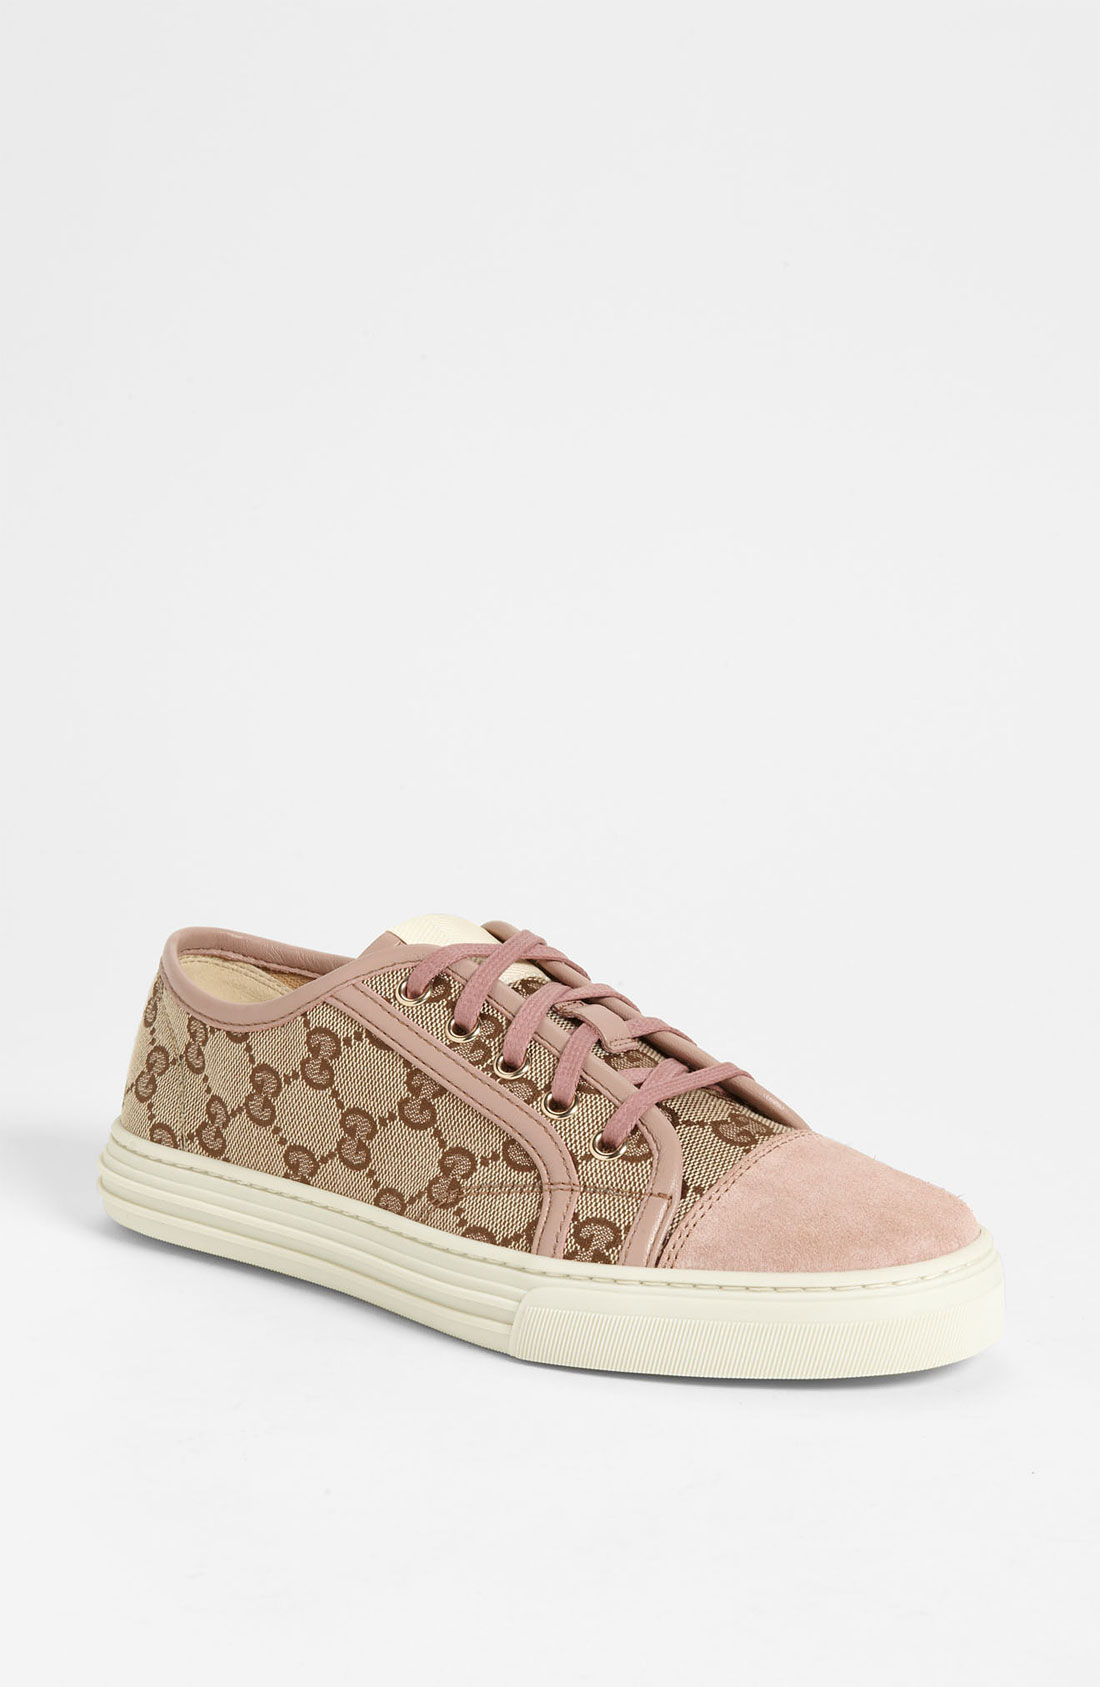 Gucci California Low Sneaker in Natural | Lyst